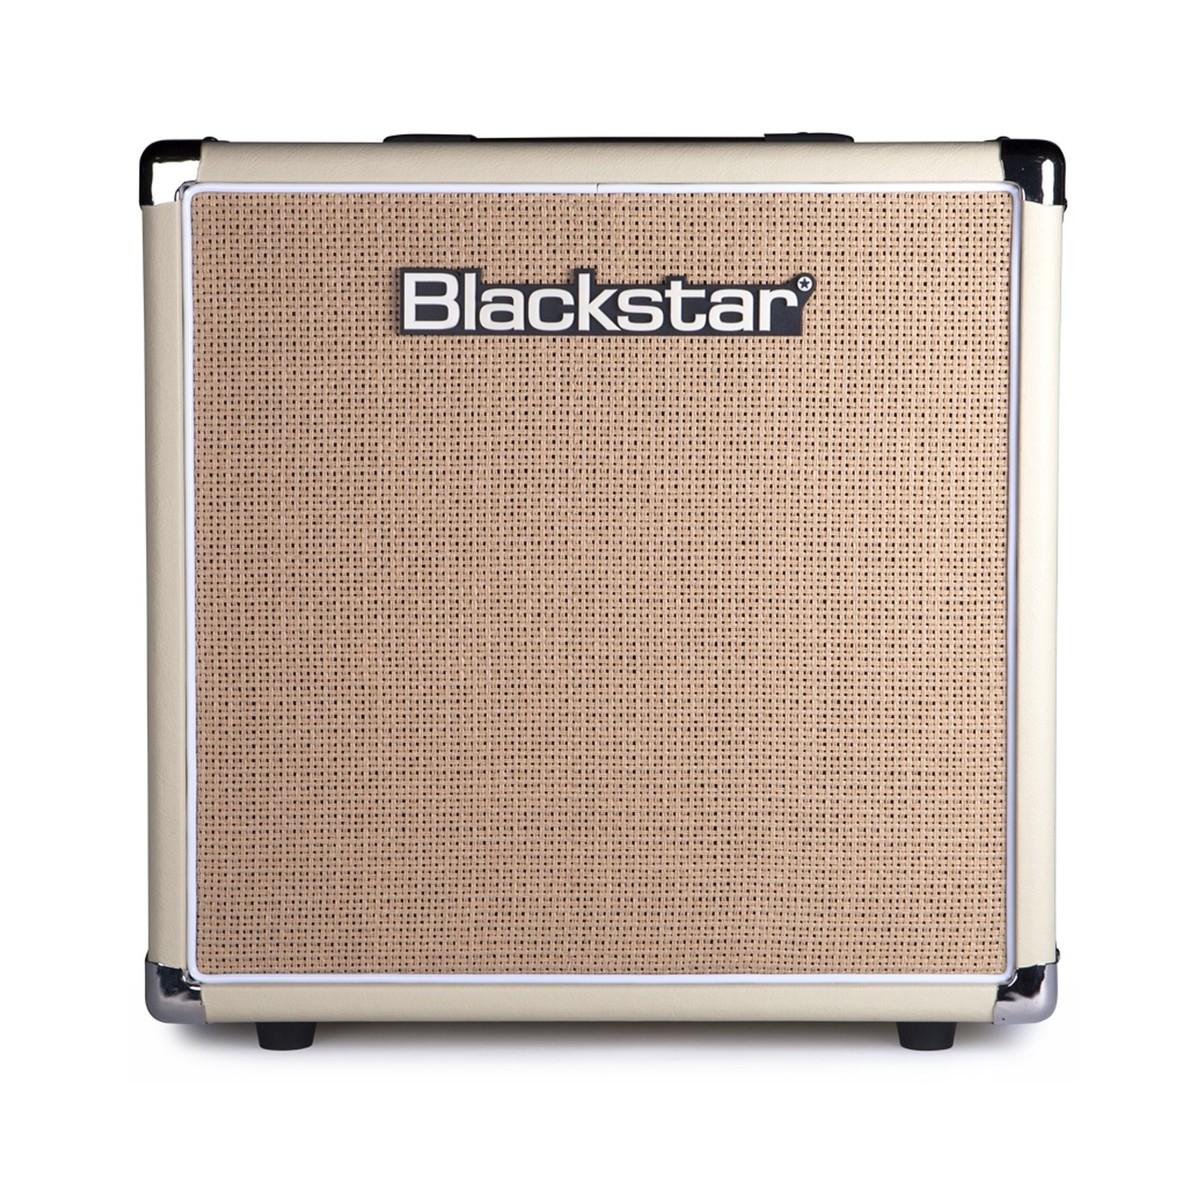 blackstar ht 1r head ht 112 1x12 cab bundle blonde at gear4music. Black Bedroom Furniture Sets. Home Design Ideas